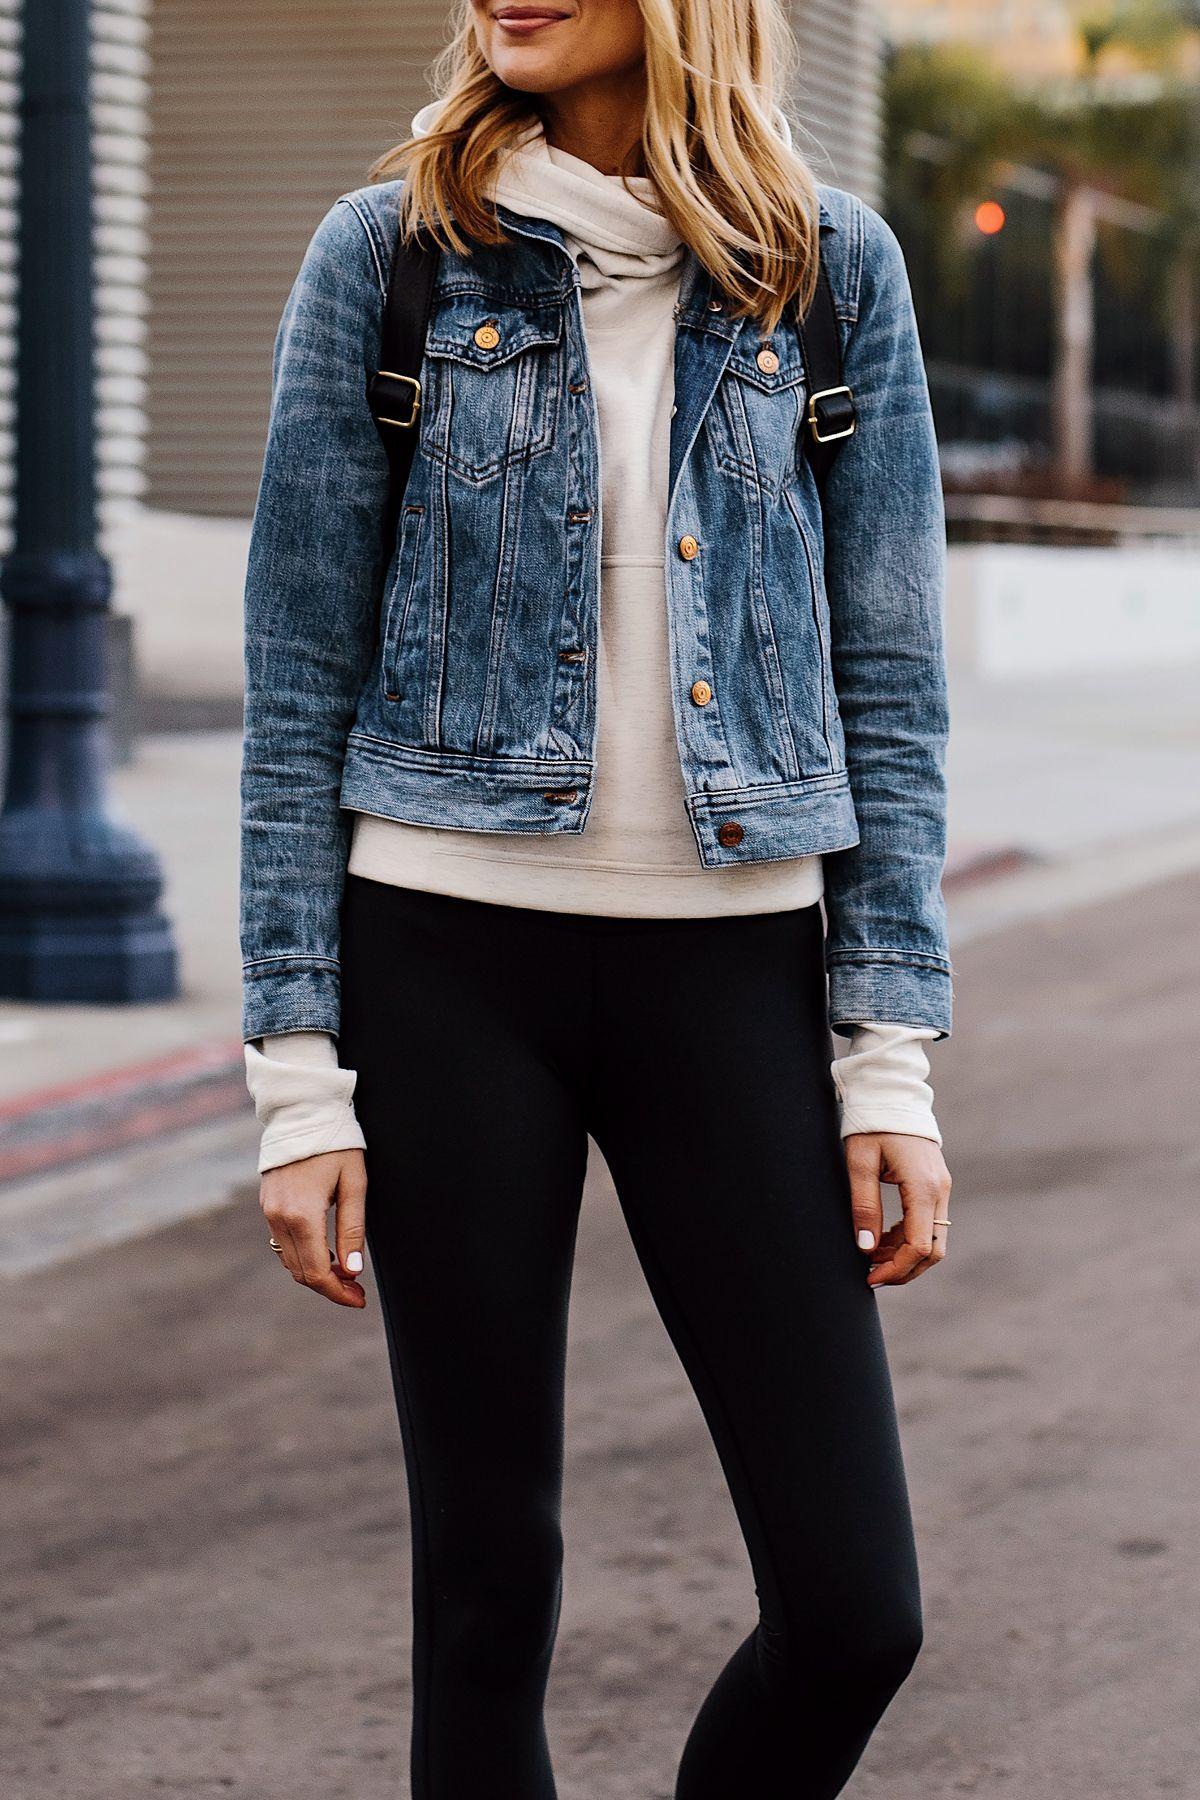 34bedcac2a7 Blonde Woman Wearing Athleisure Outfit Wearing Denim Jacket Grey Sweatshirt  Black Leggings Fashion Jackson San Diego Fashion Blogger Street Style